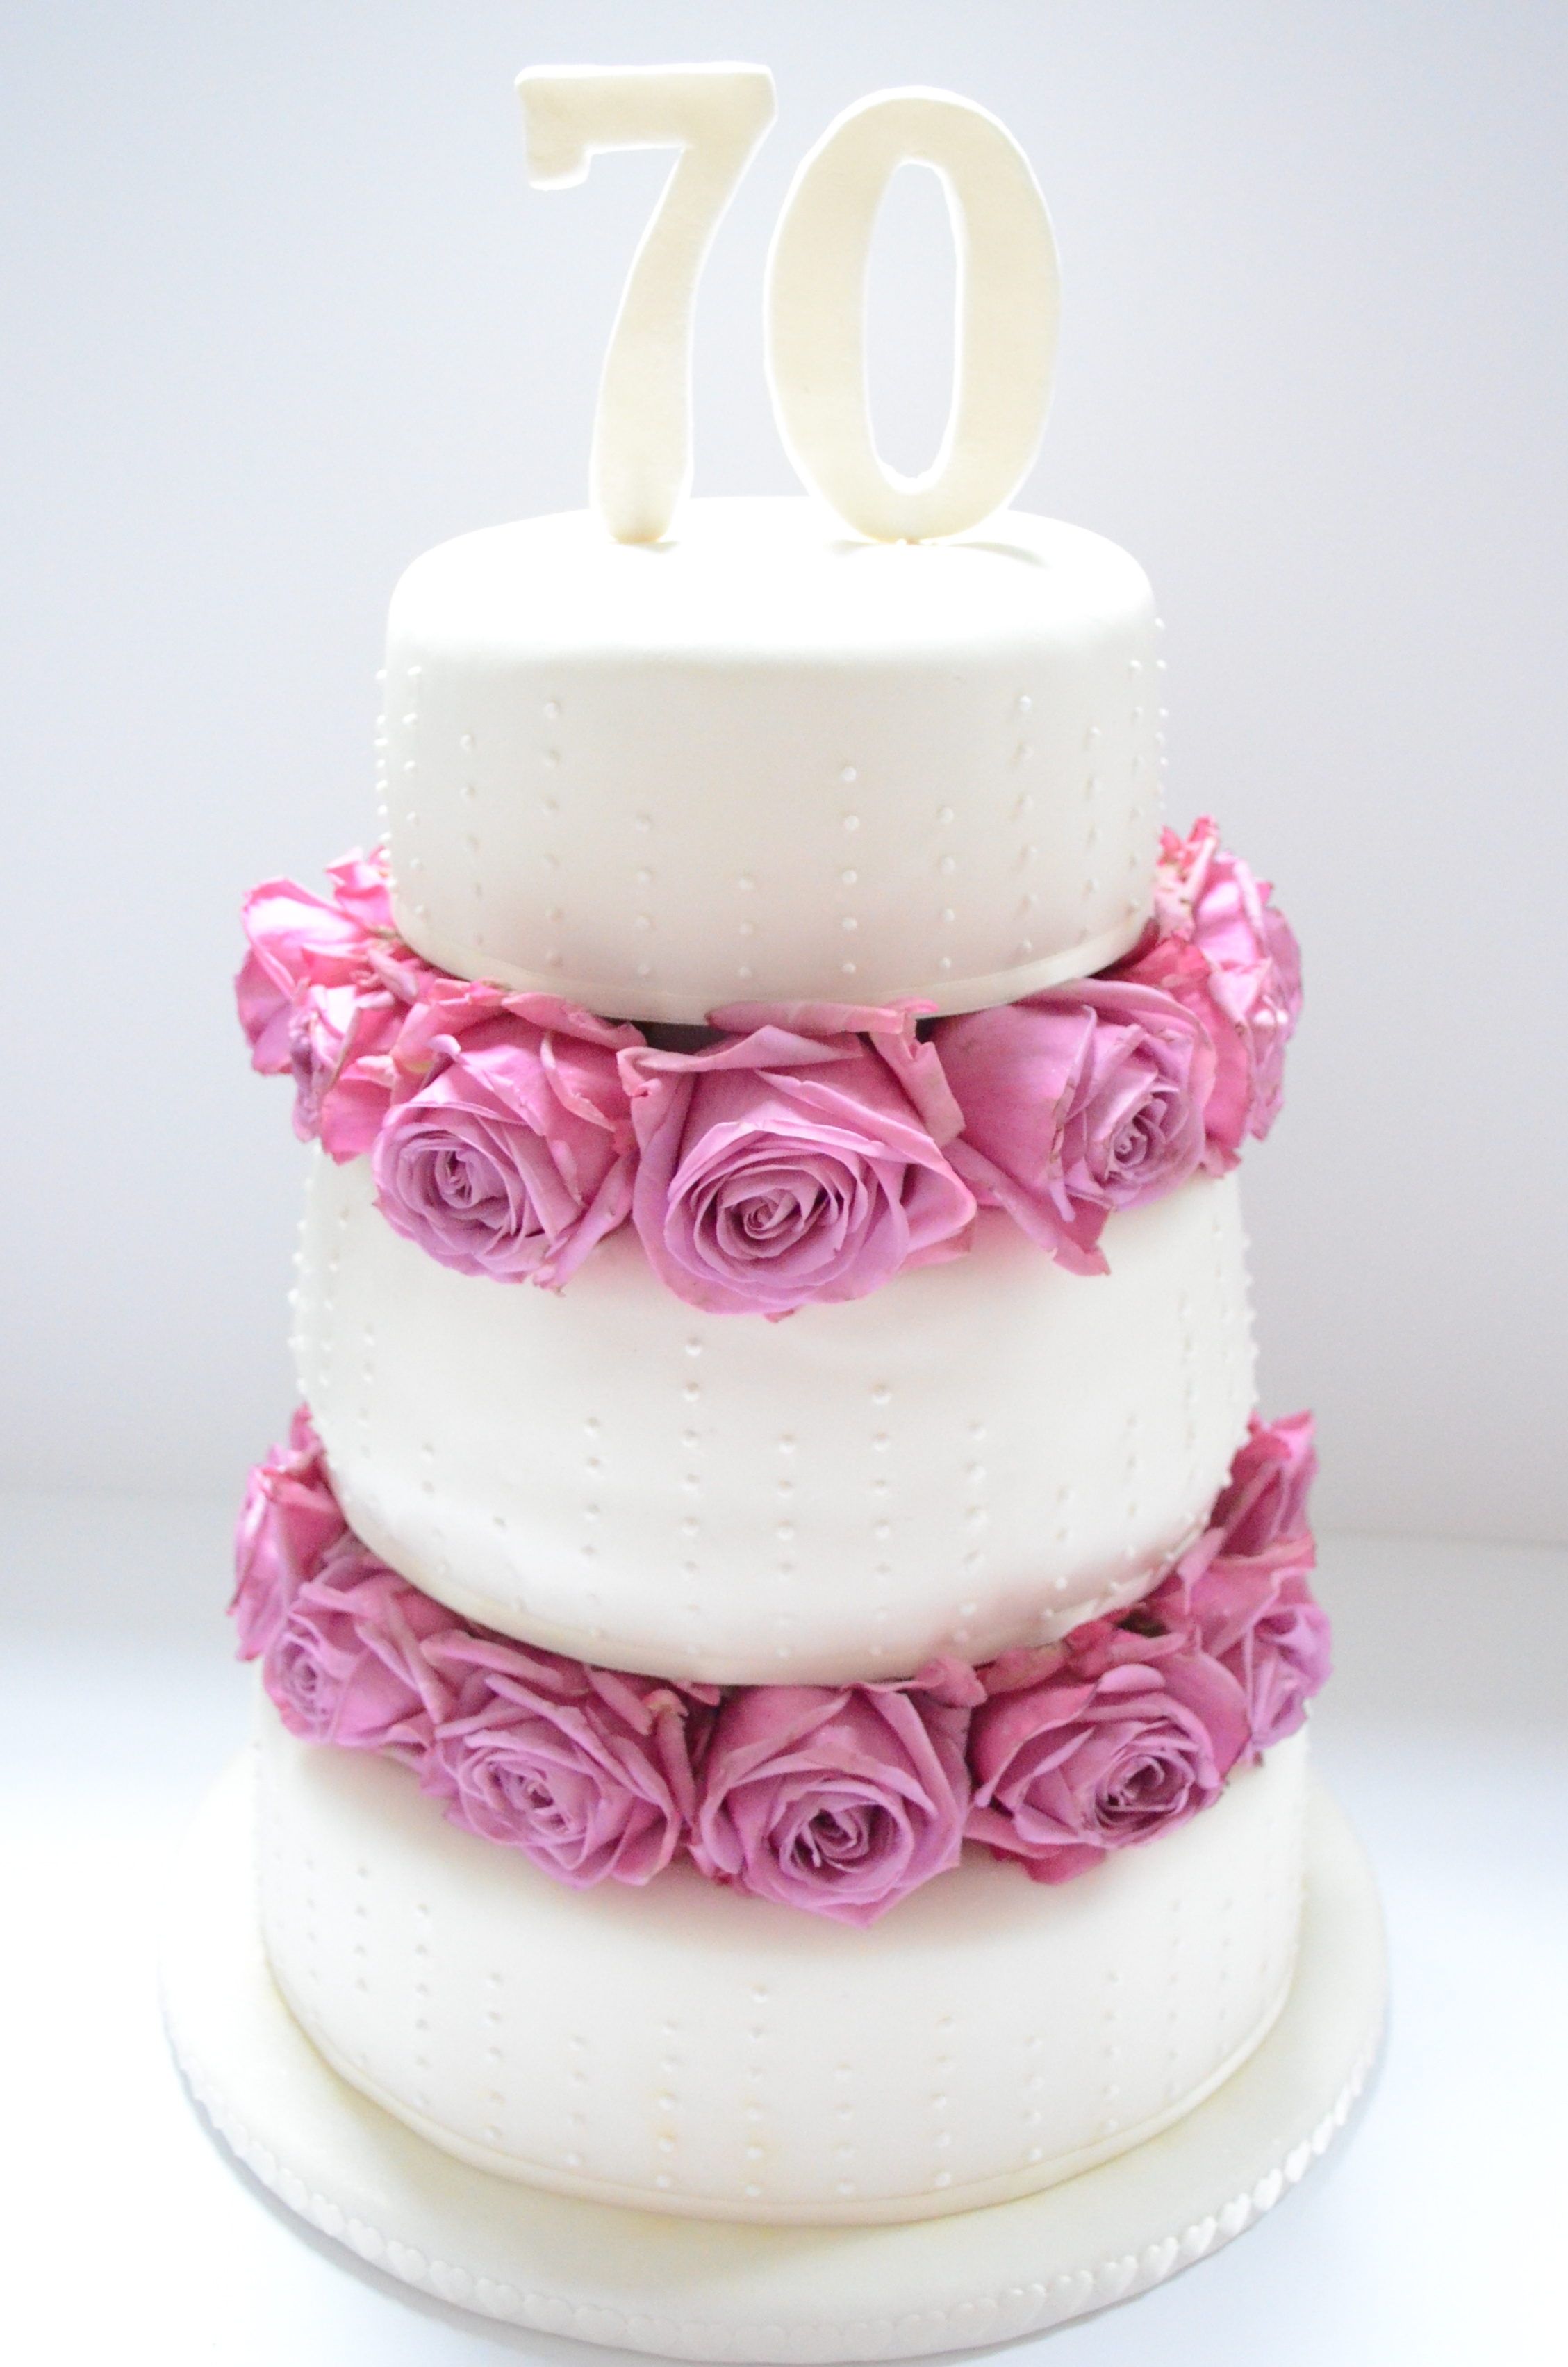 Trendy Dad India Three Tiered Birthday Fondant Cake Midnight Hausfrau Birthday Cake Ideas Three Tiered Birt 70th Birthday Party Ideas Nz 70th Birthday Party Ideas ideas 70th Birthday Party Ideas